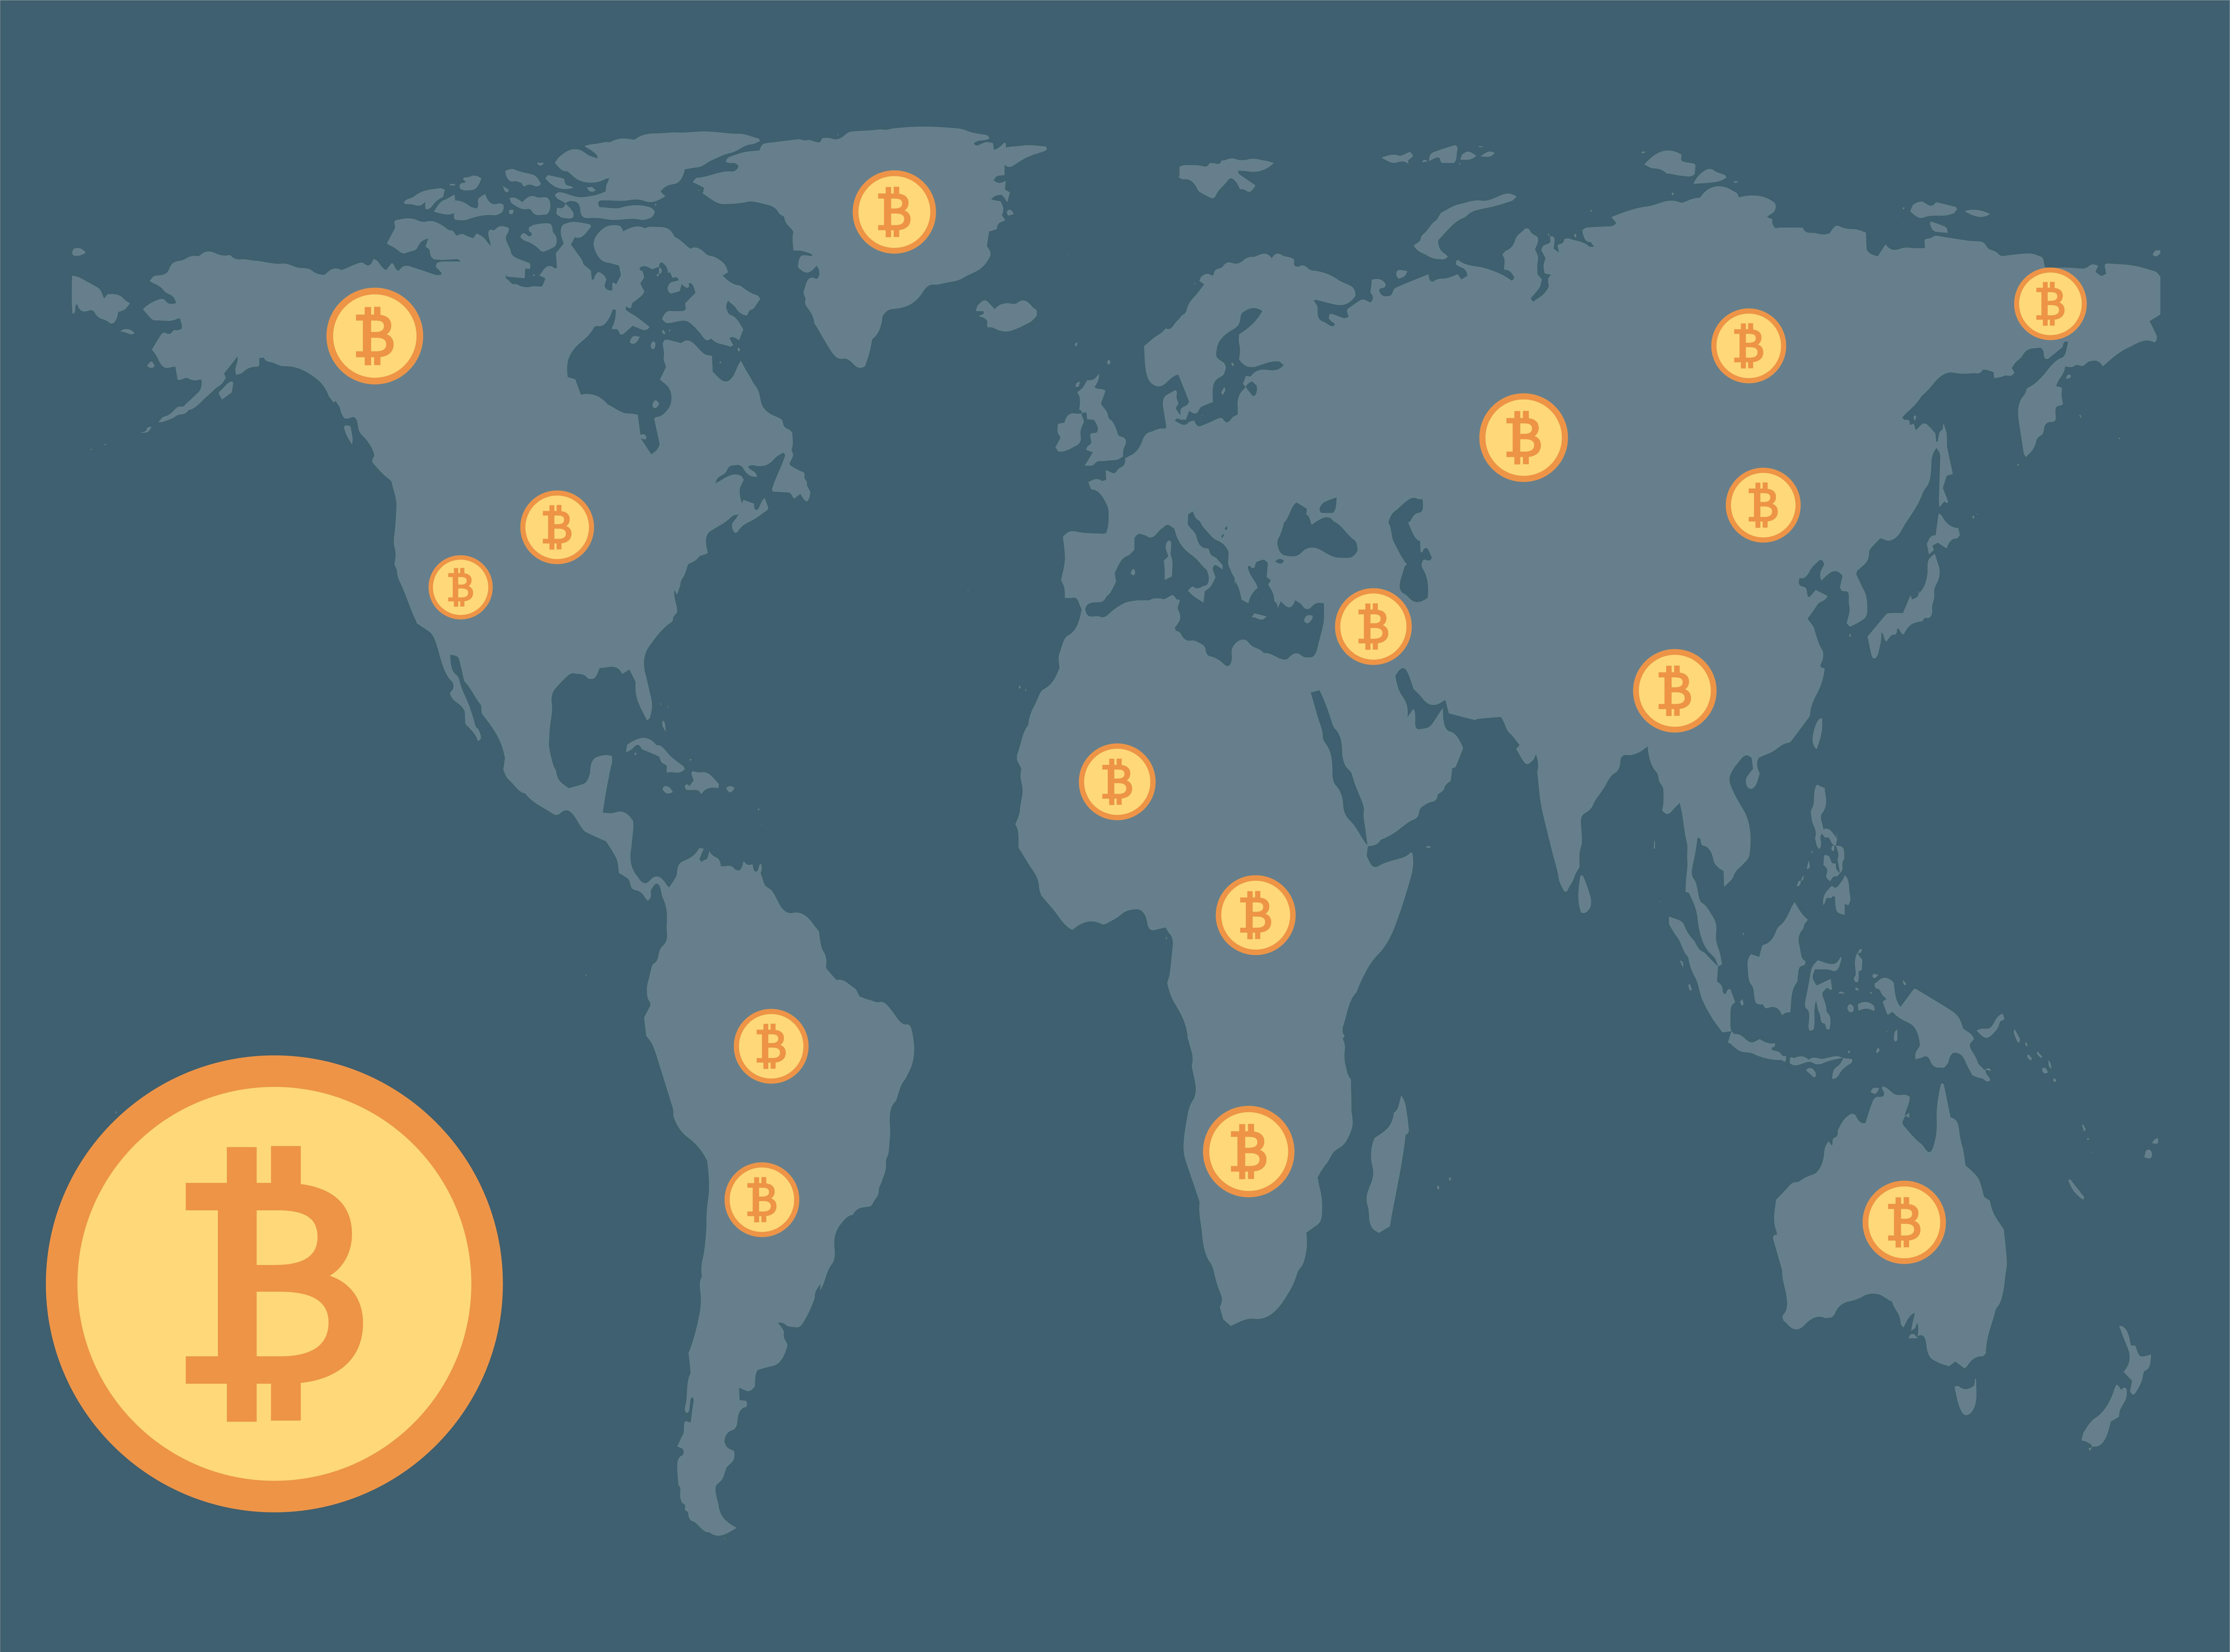 Bitcoins spread around on map - Download Free Vectors, Clipart Graphics & Vector Art